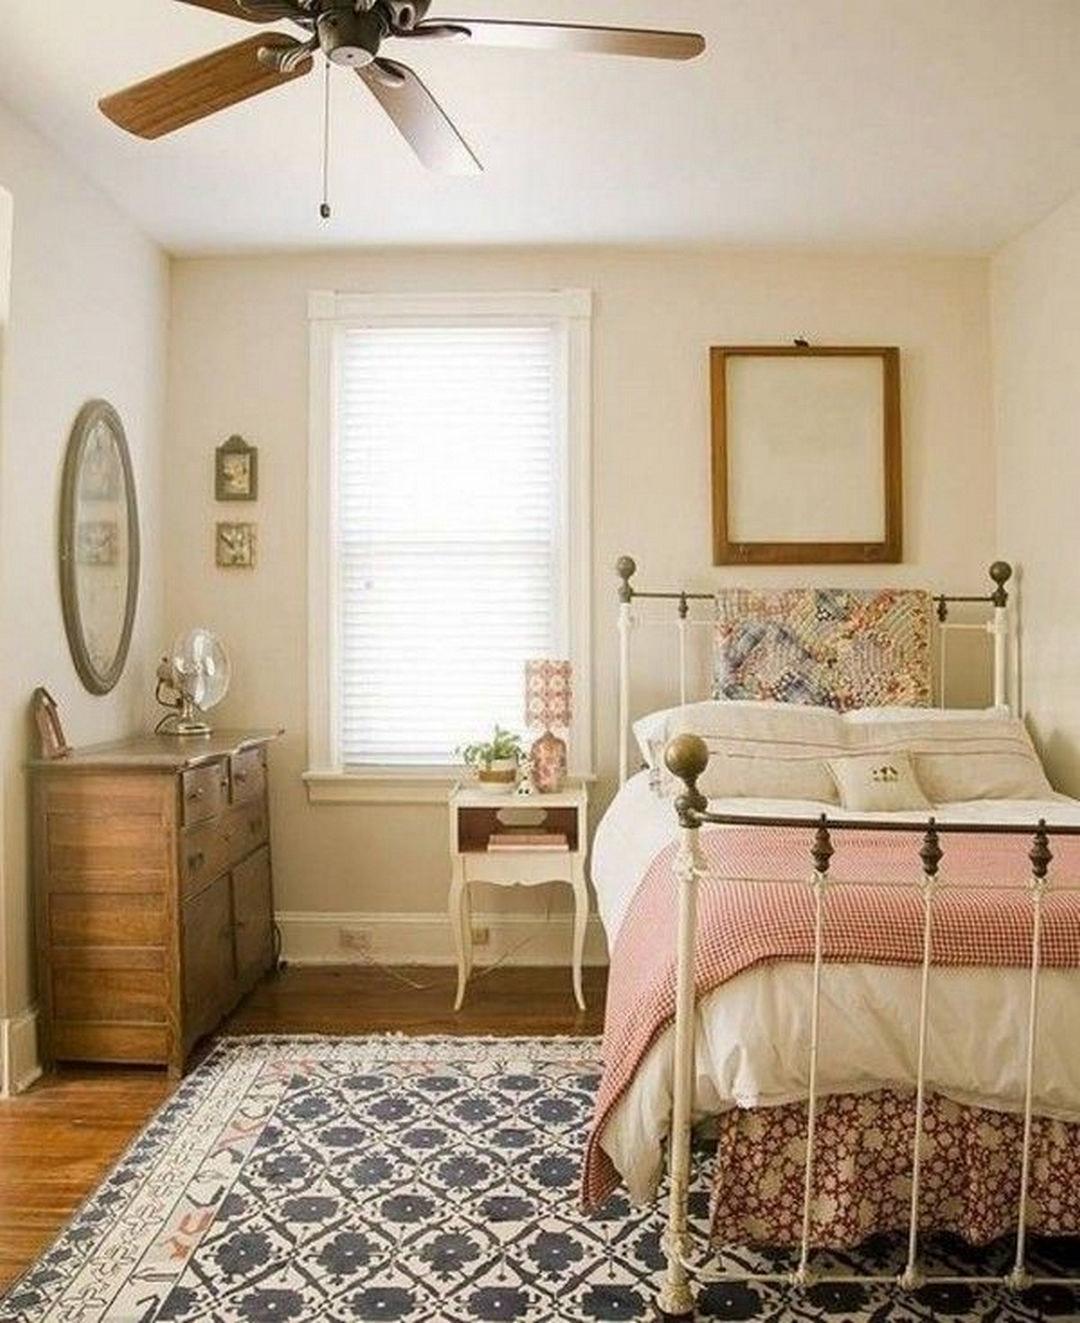 Cozy Small Bedroom Tips 12 Ideas To Bring Comforts Into Your Small Room Cozy Small Bedrooms Bedroom Vintage Remodel Bedroom